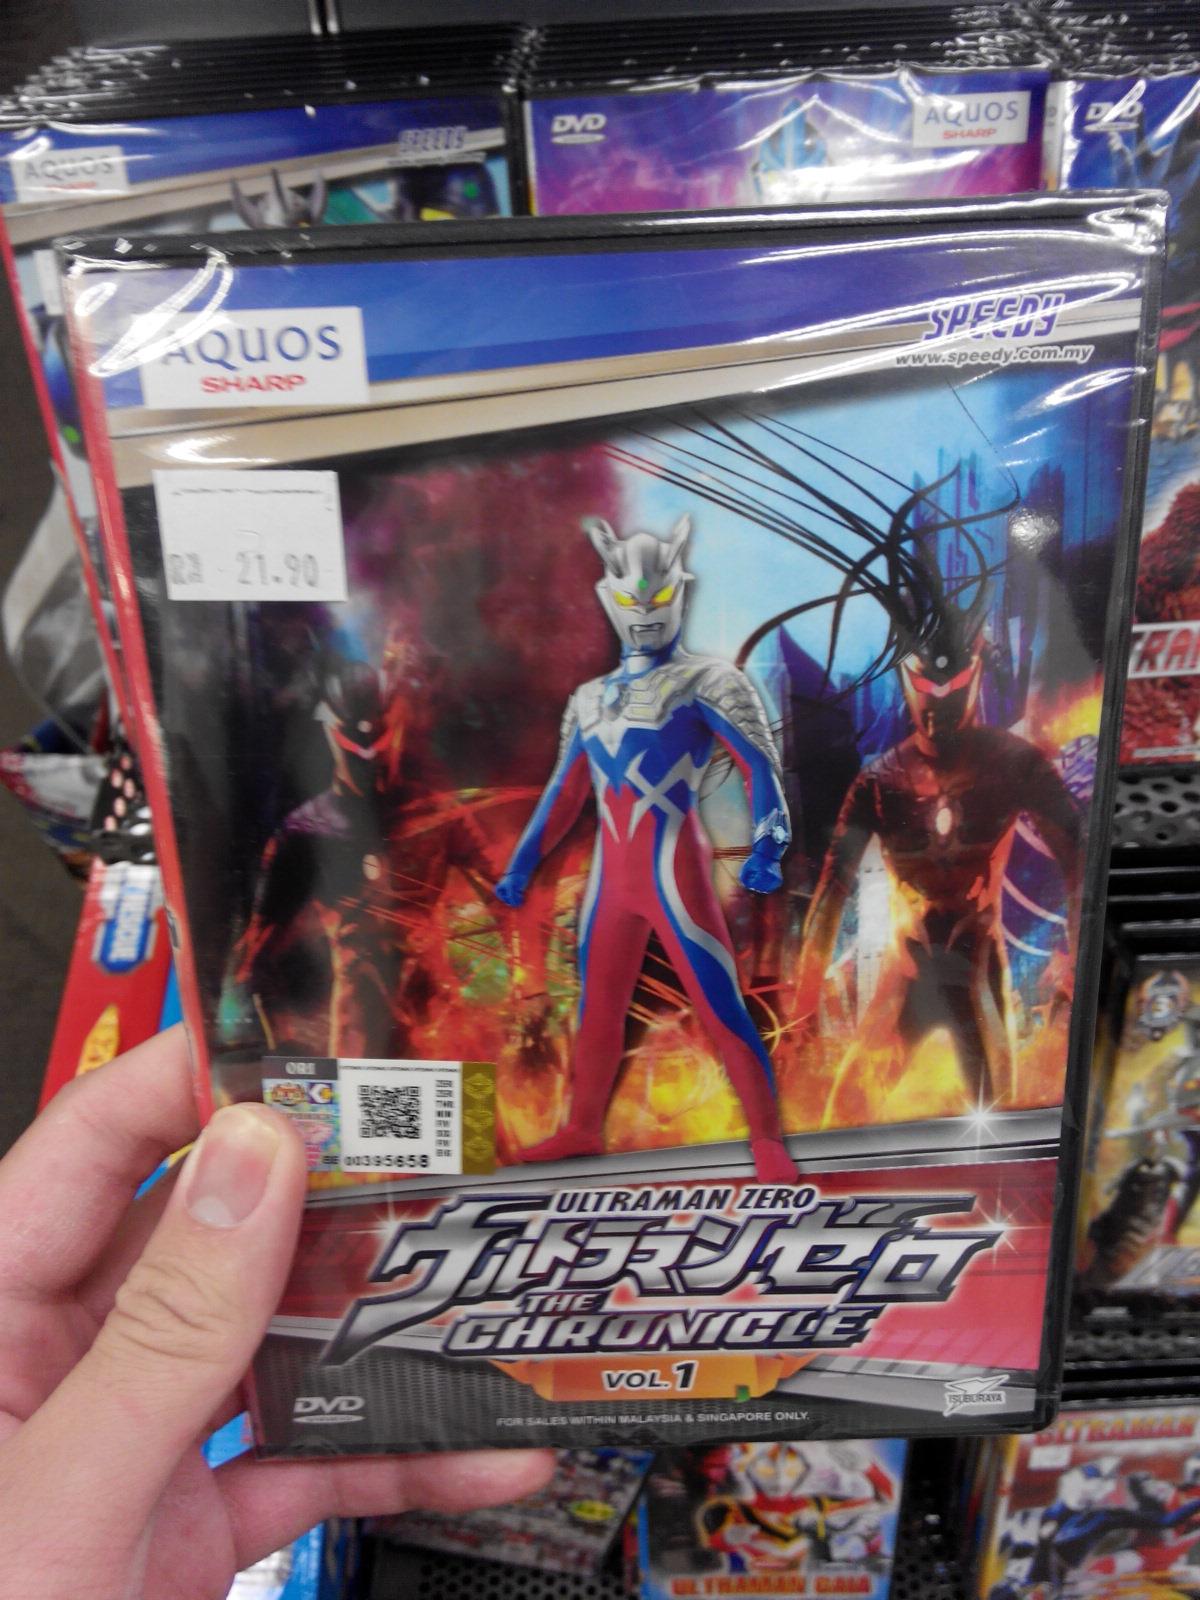 FigureGunplaFan/Ultraman Zero: The Chronicle DVDs released in Malaysia